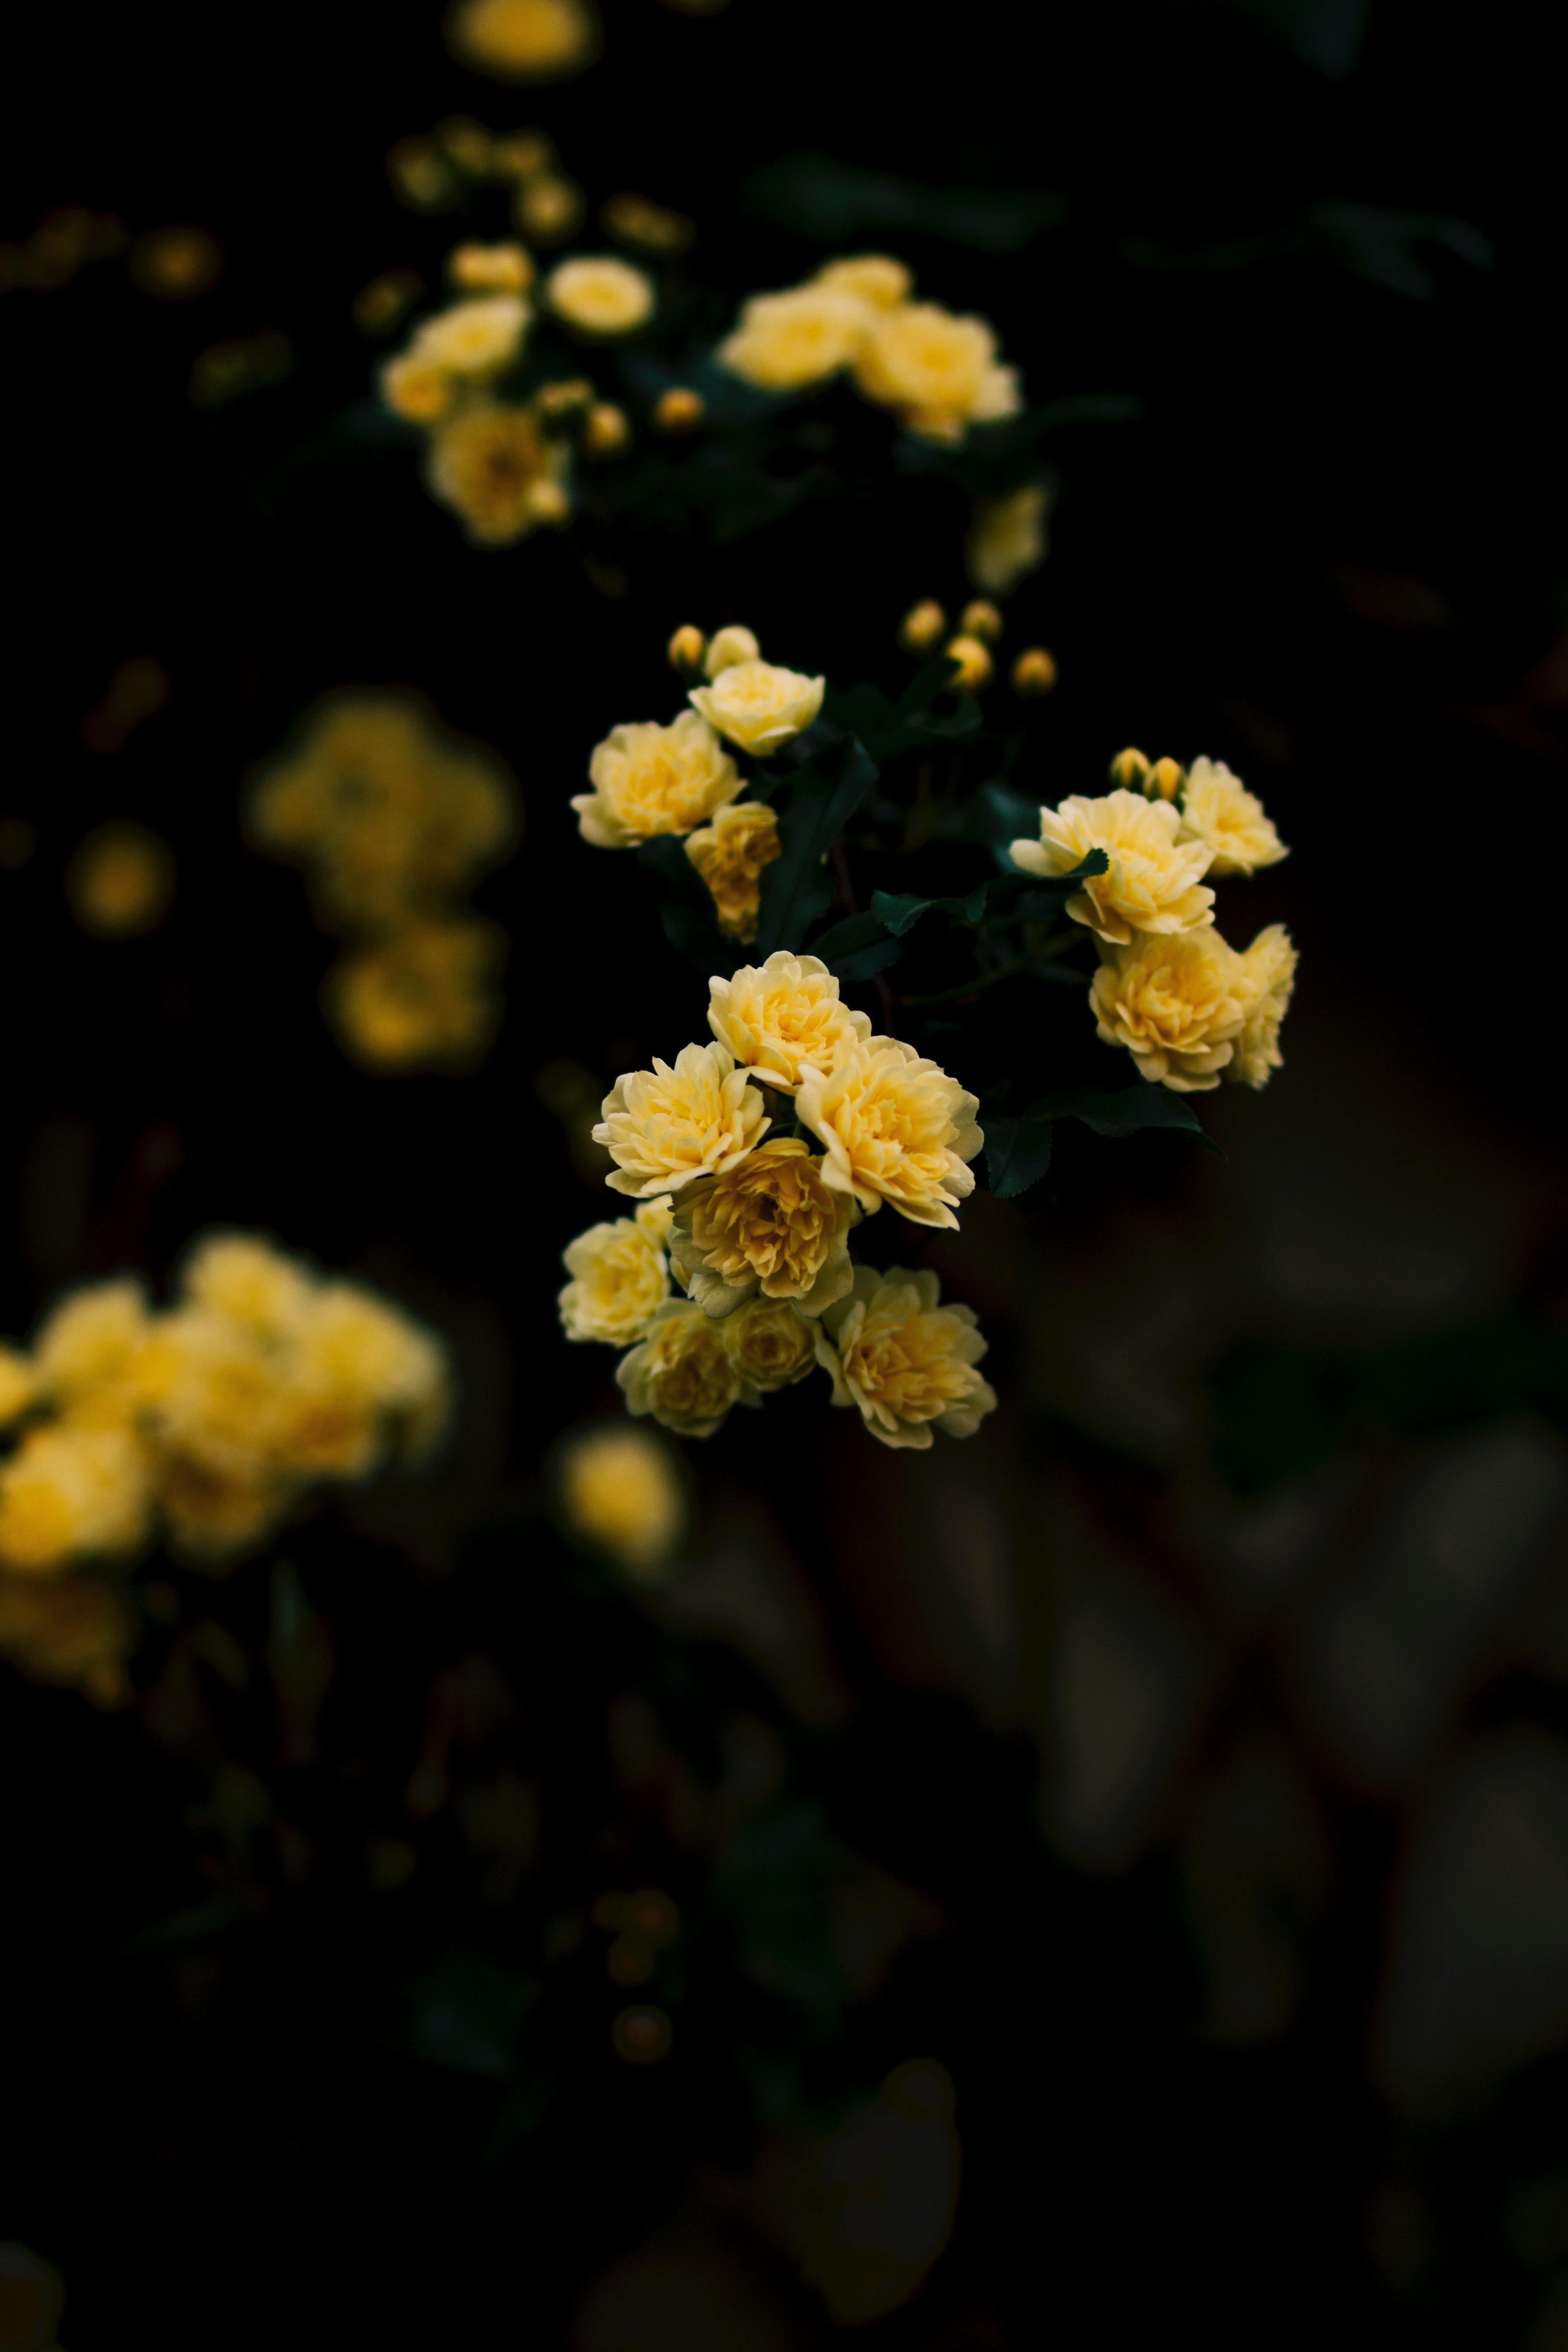 Yellow Rose Iphone Wallpaper Idrop News